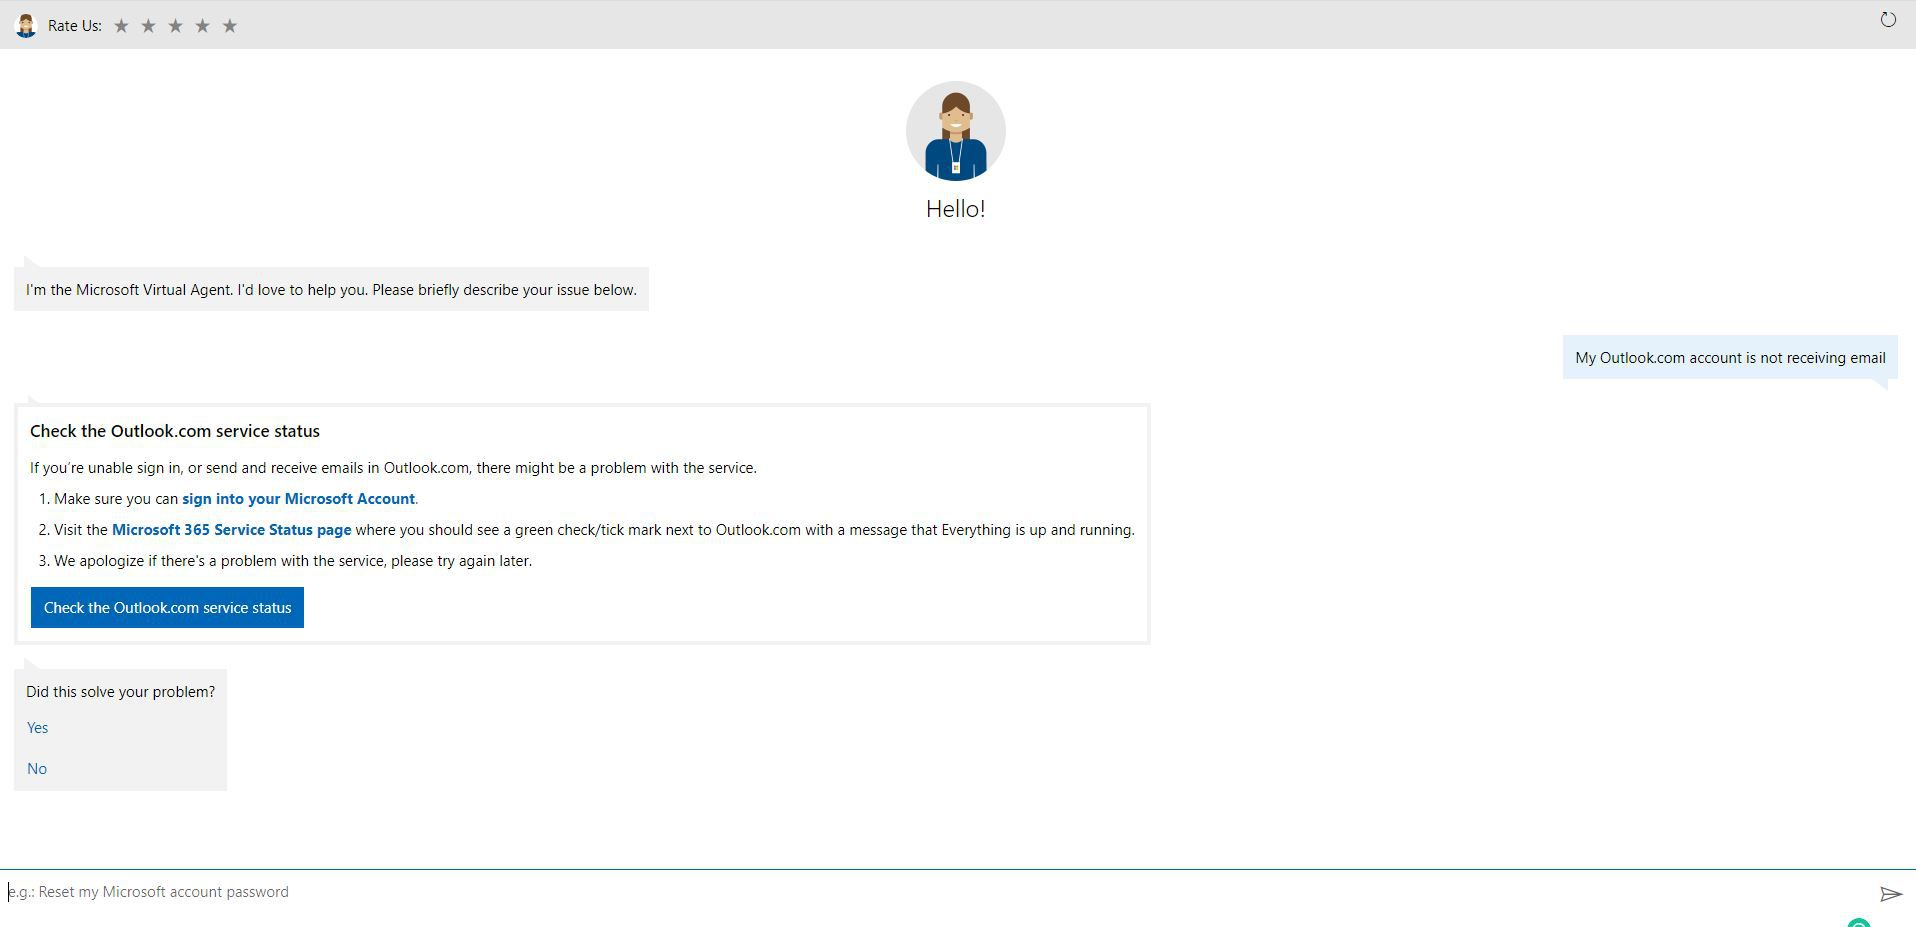 Microsoft Virtual Agent chat